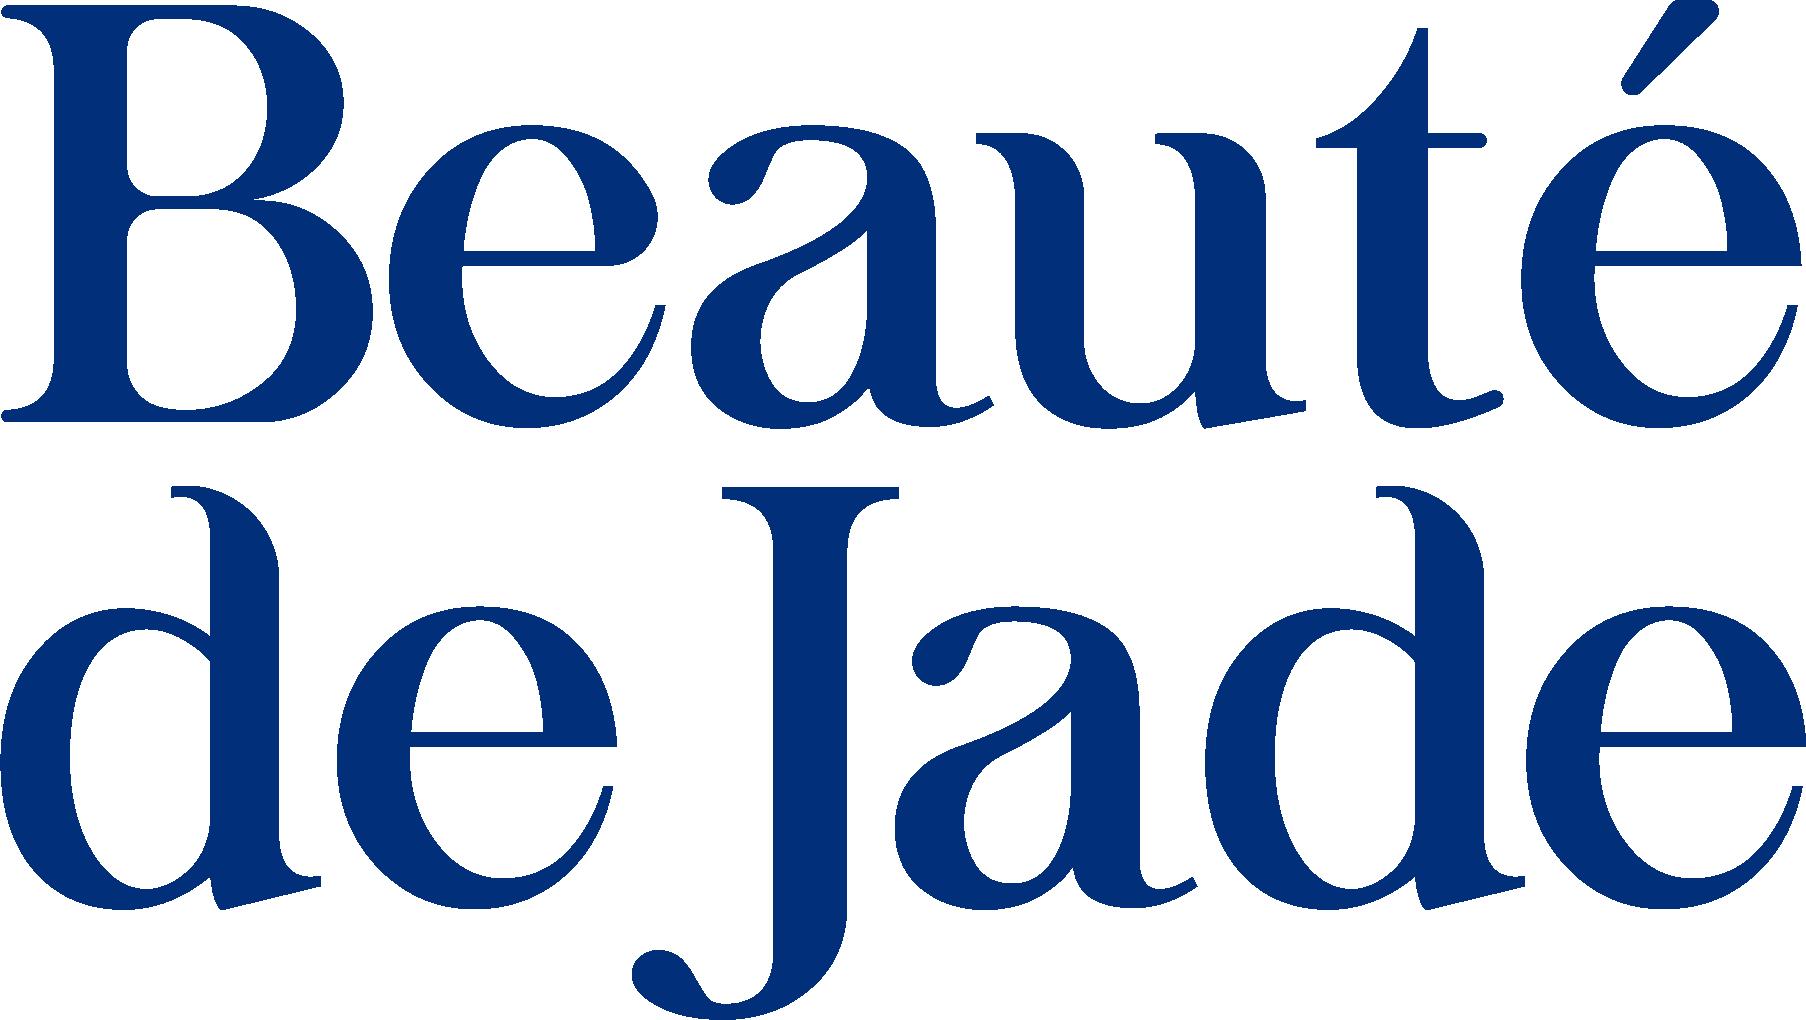 Mỹ Phẩm Beaute De Jade